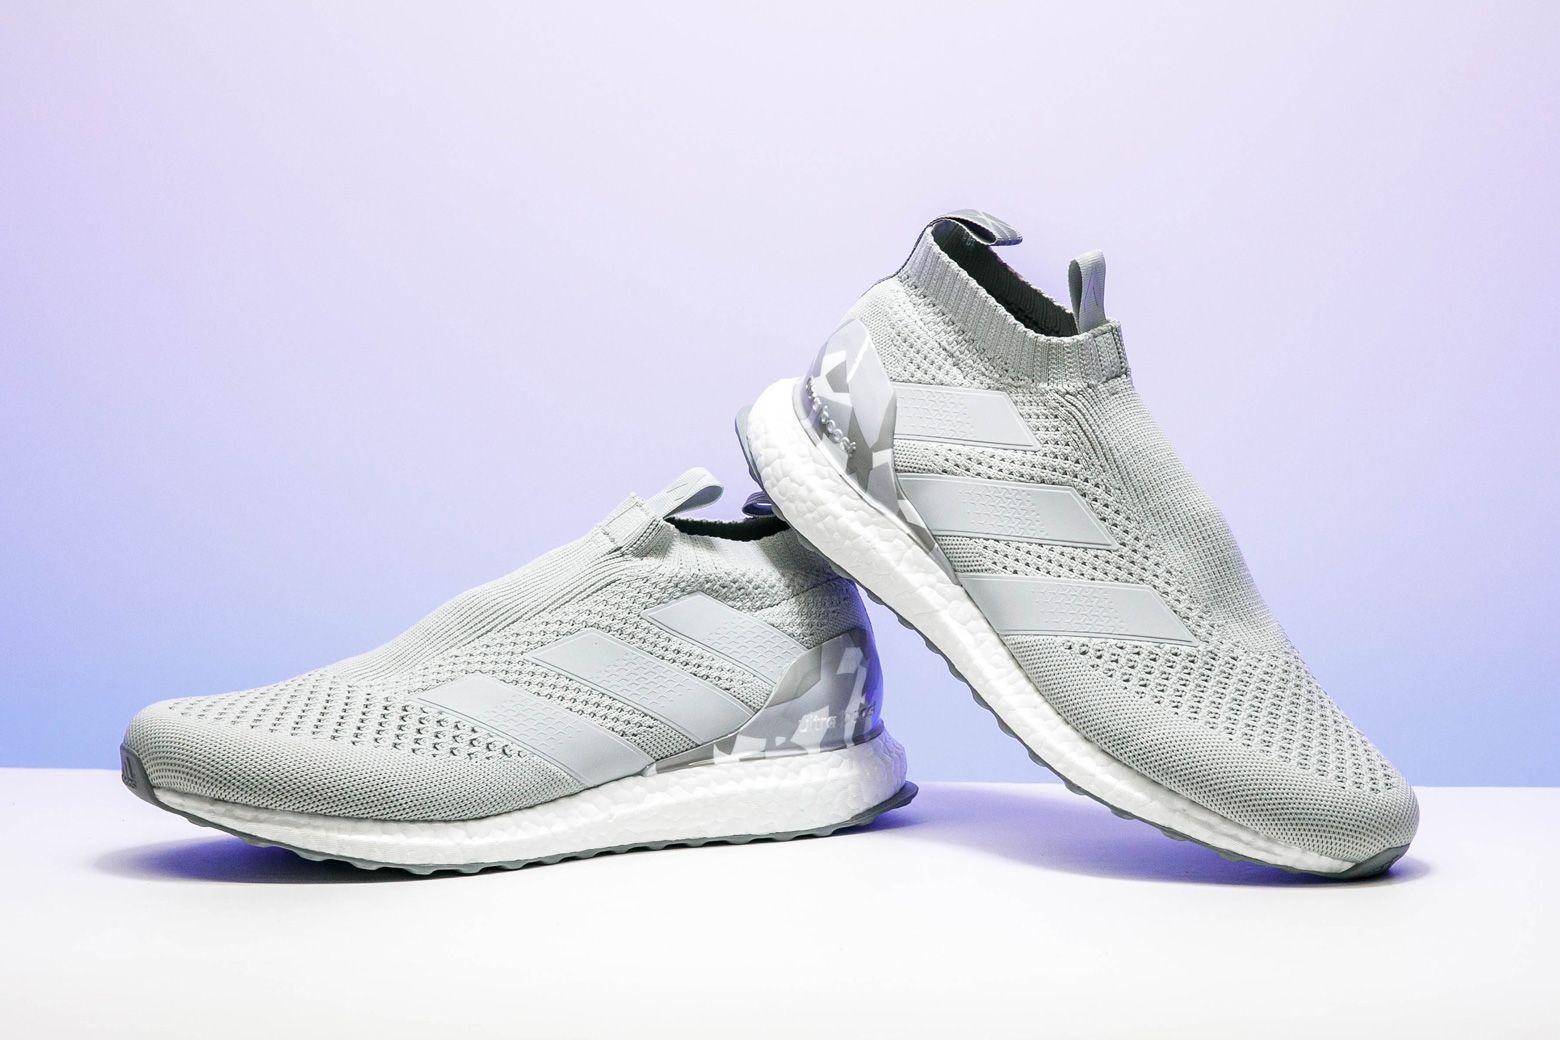 Adidas Ace 17 Purecontrol Ultraboost Snow Camo By9089 Adidas Ultra Boost Heels